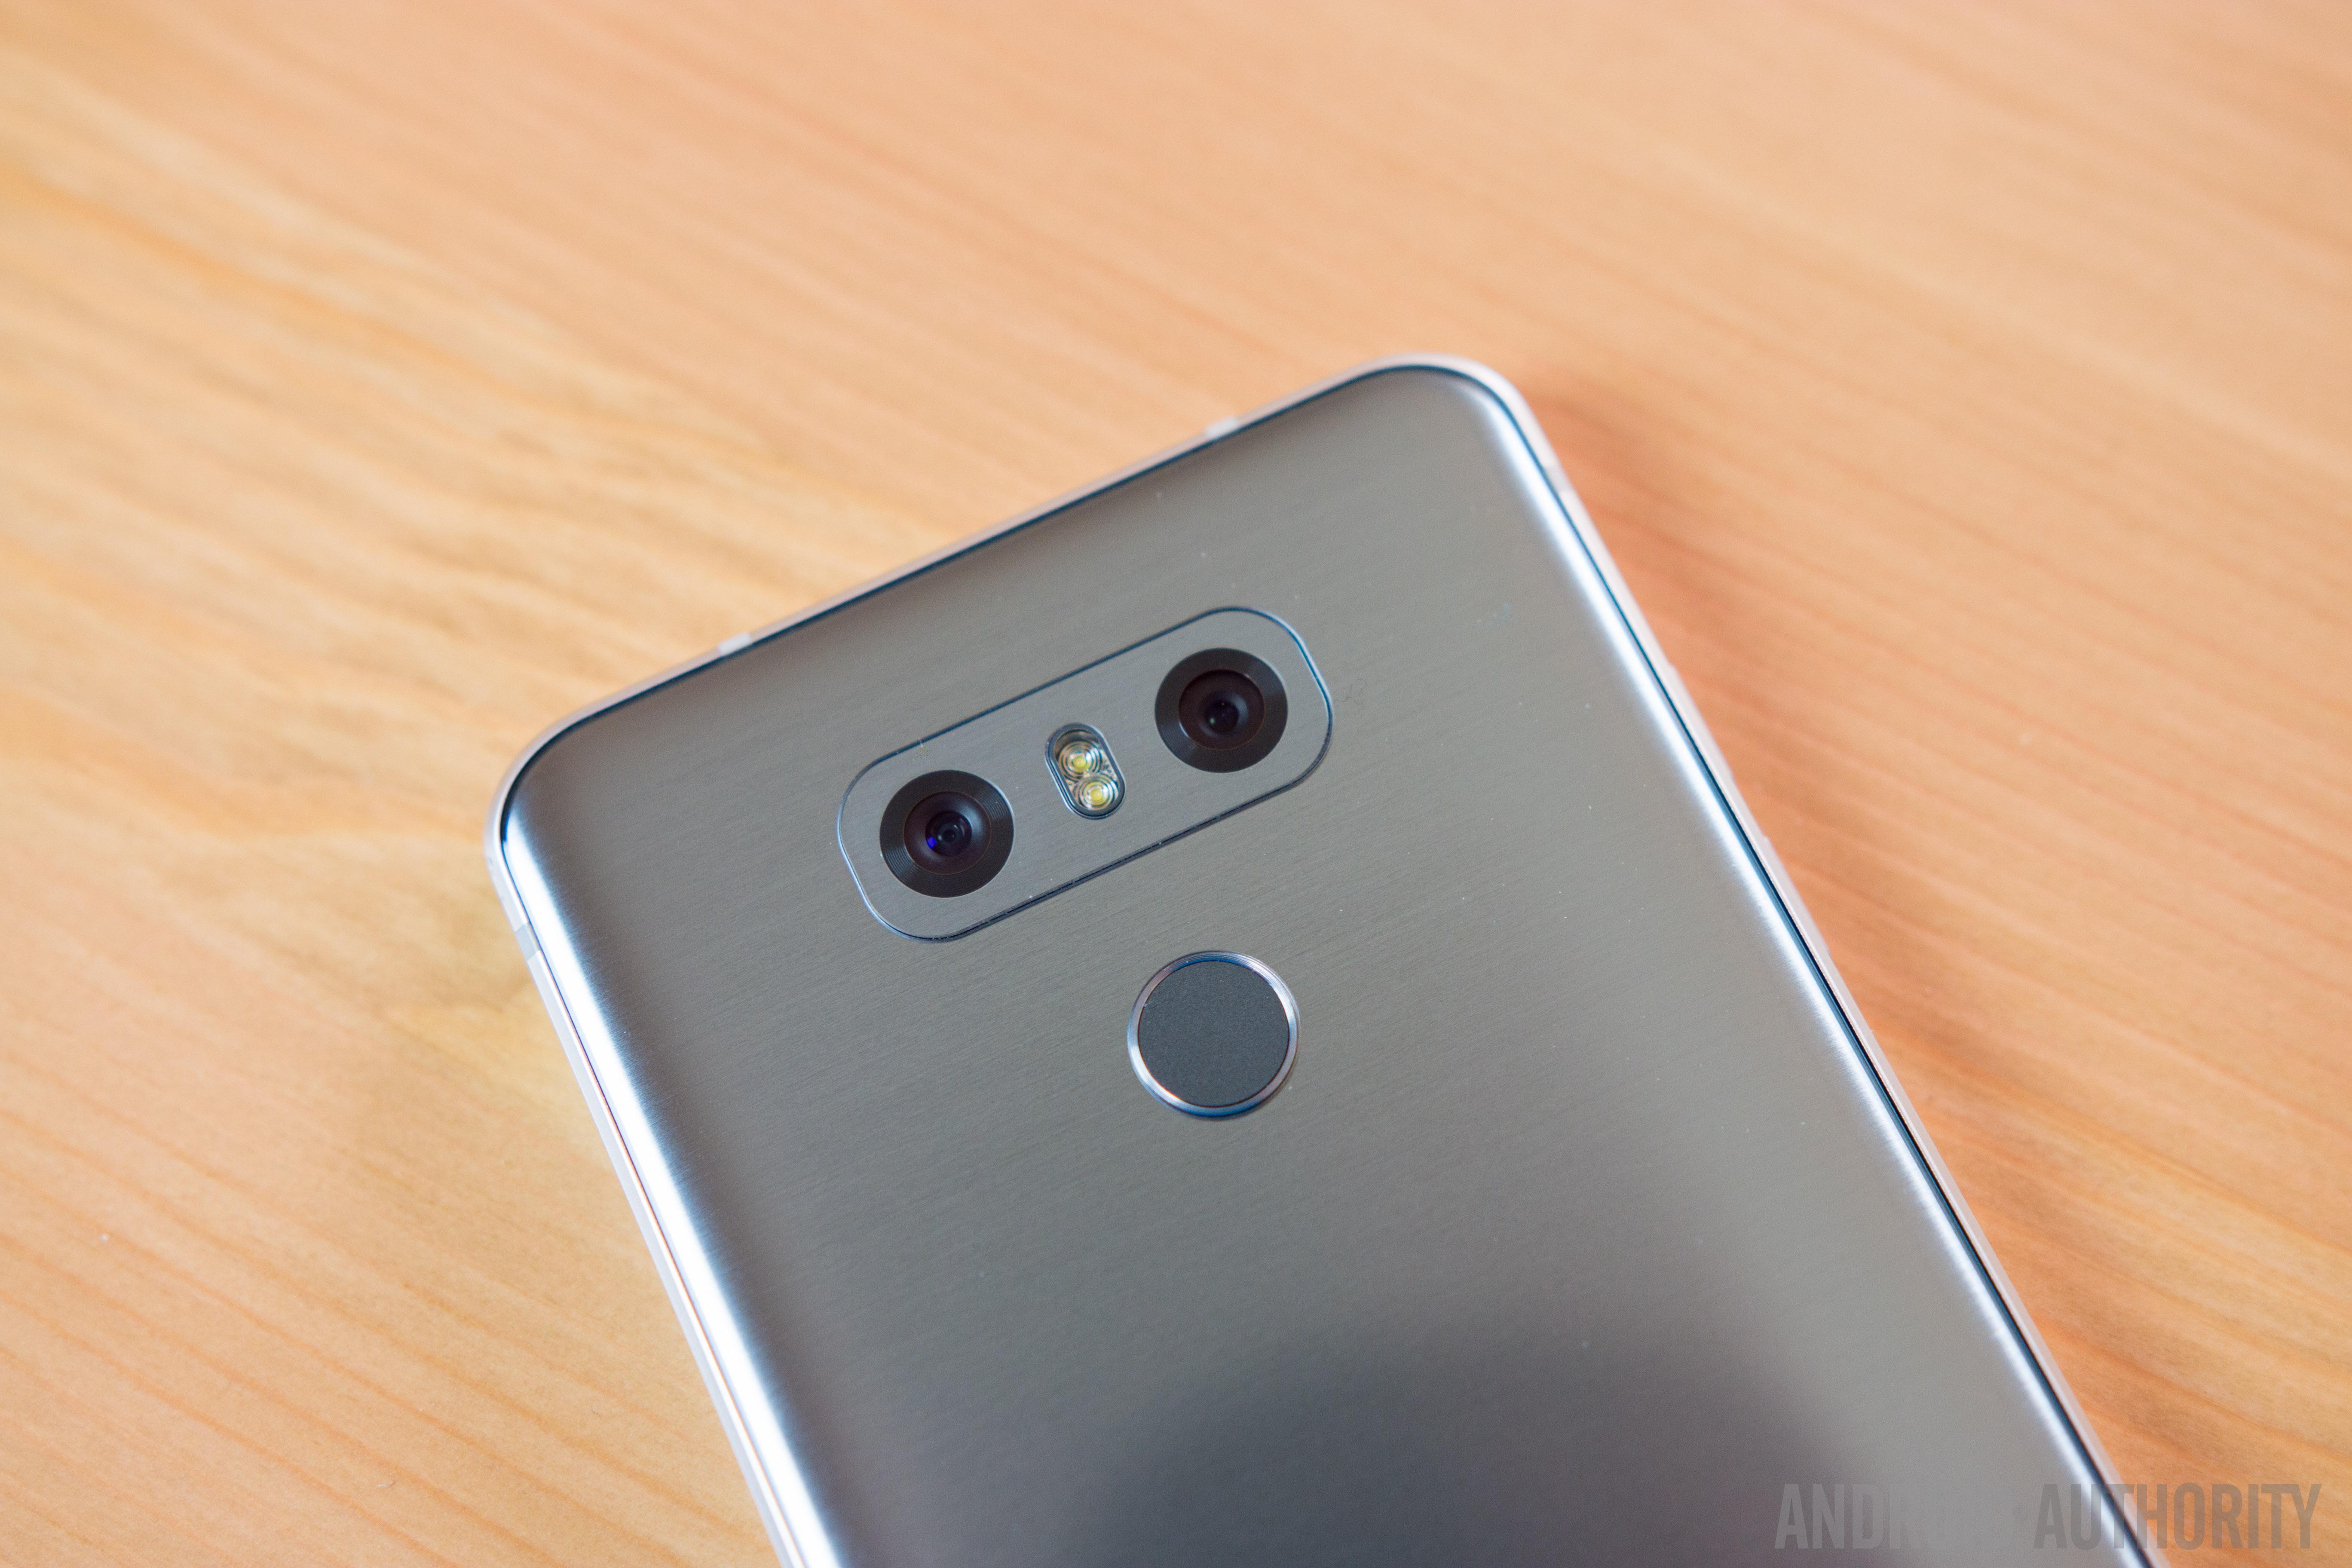 LG G6 problems